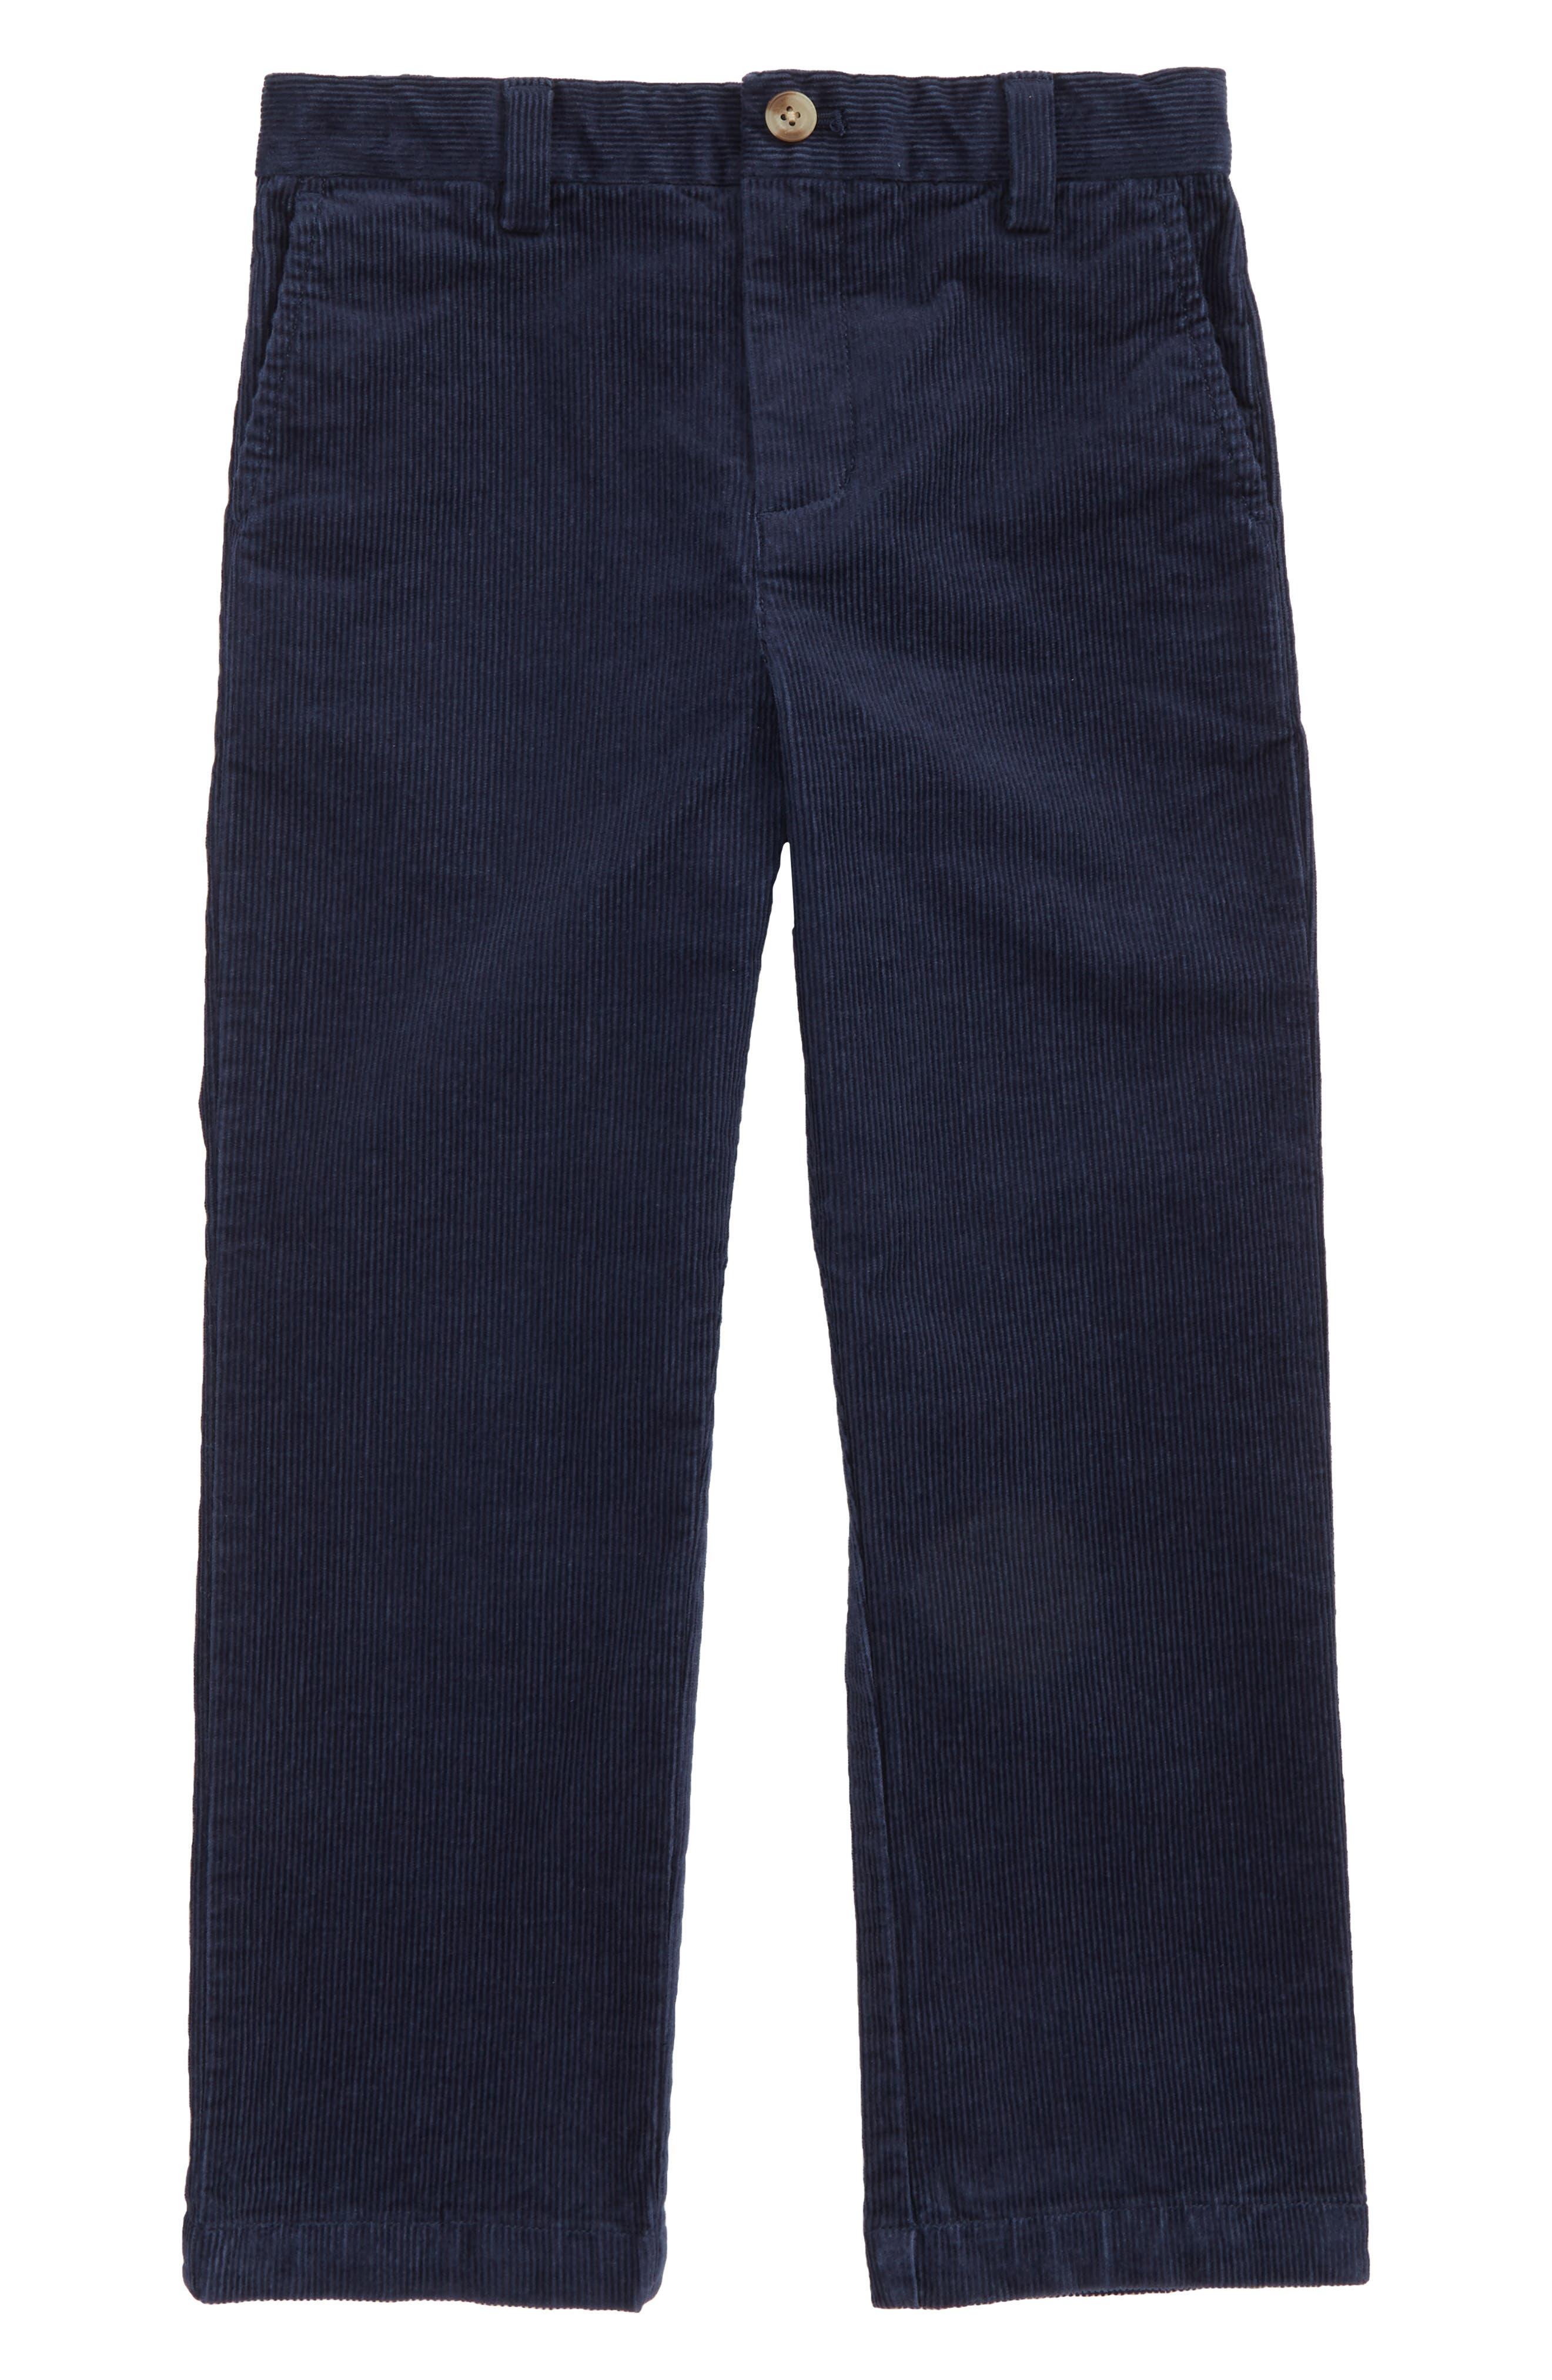 Toddler Boys Vineyard Vines Corduroy Breaker Pants Size 2T  Blue